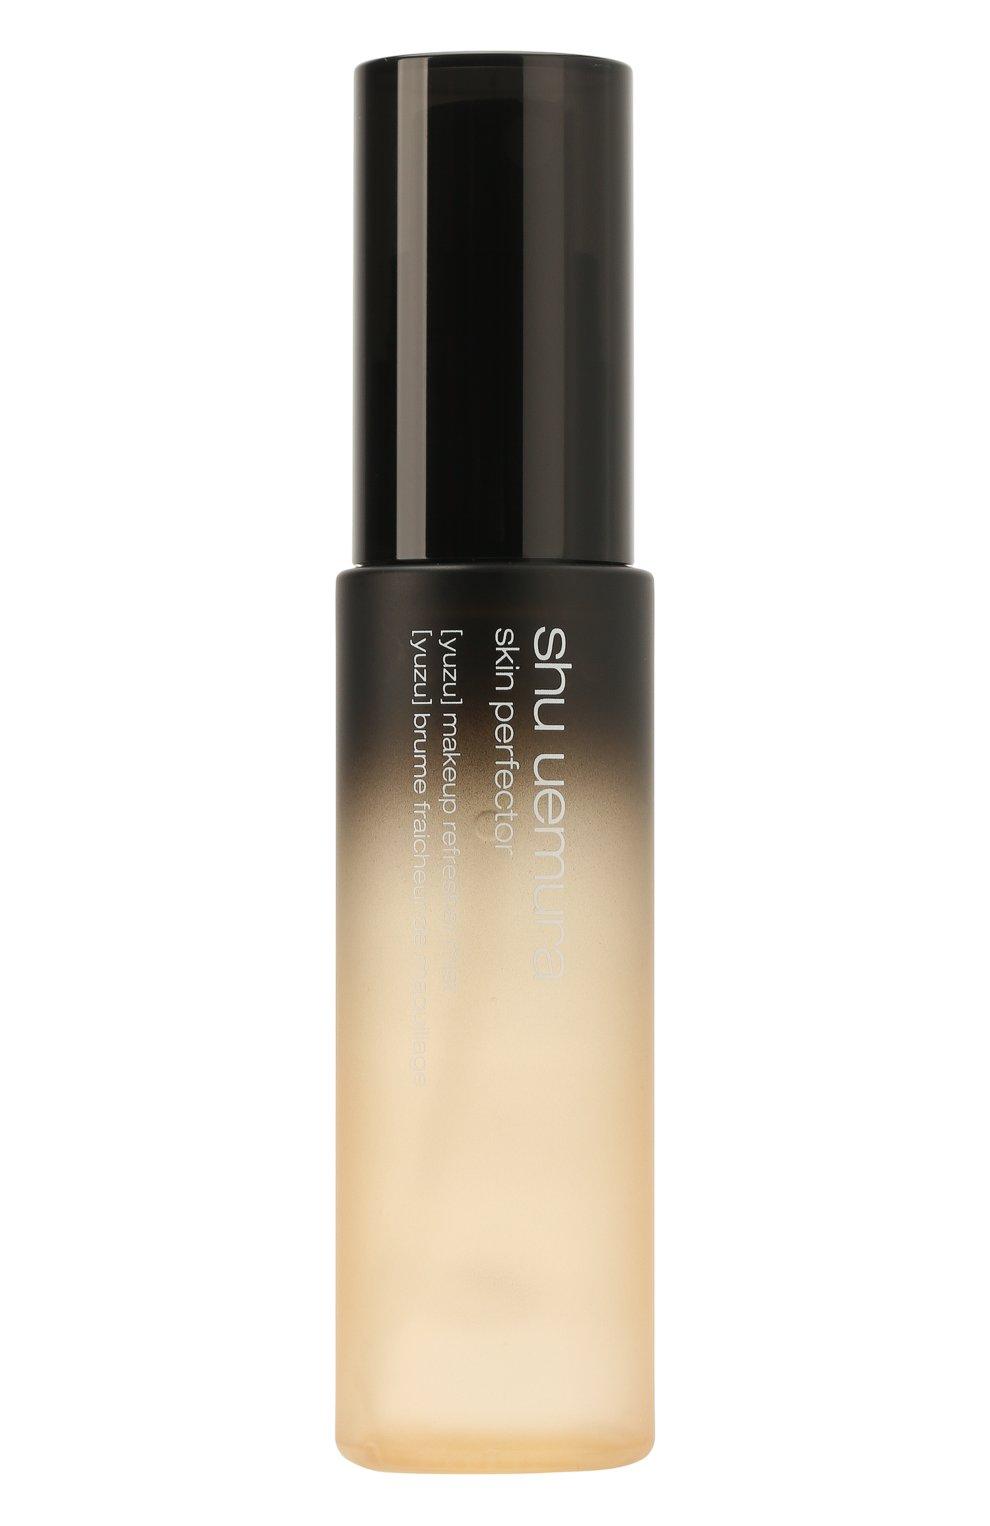 Освежающий мист для макияжа Skin Perfector Mist Yuzu   Фото №1